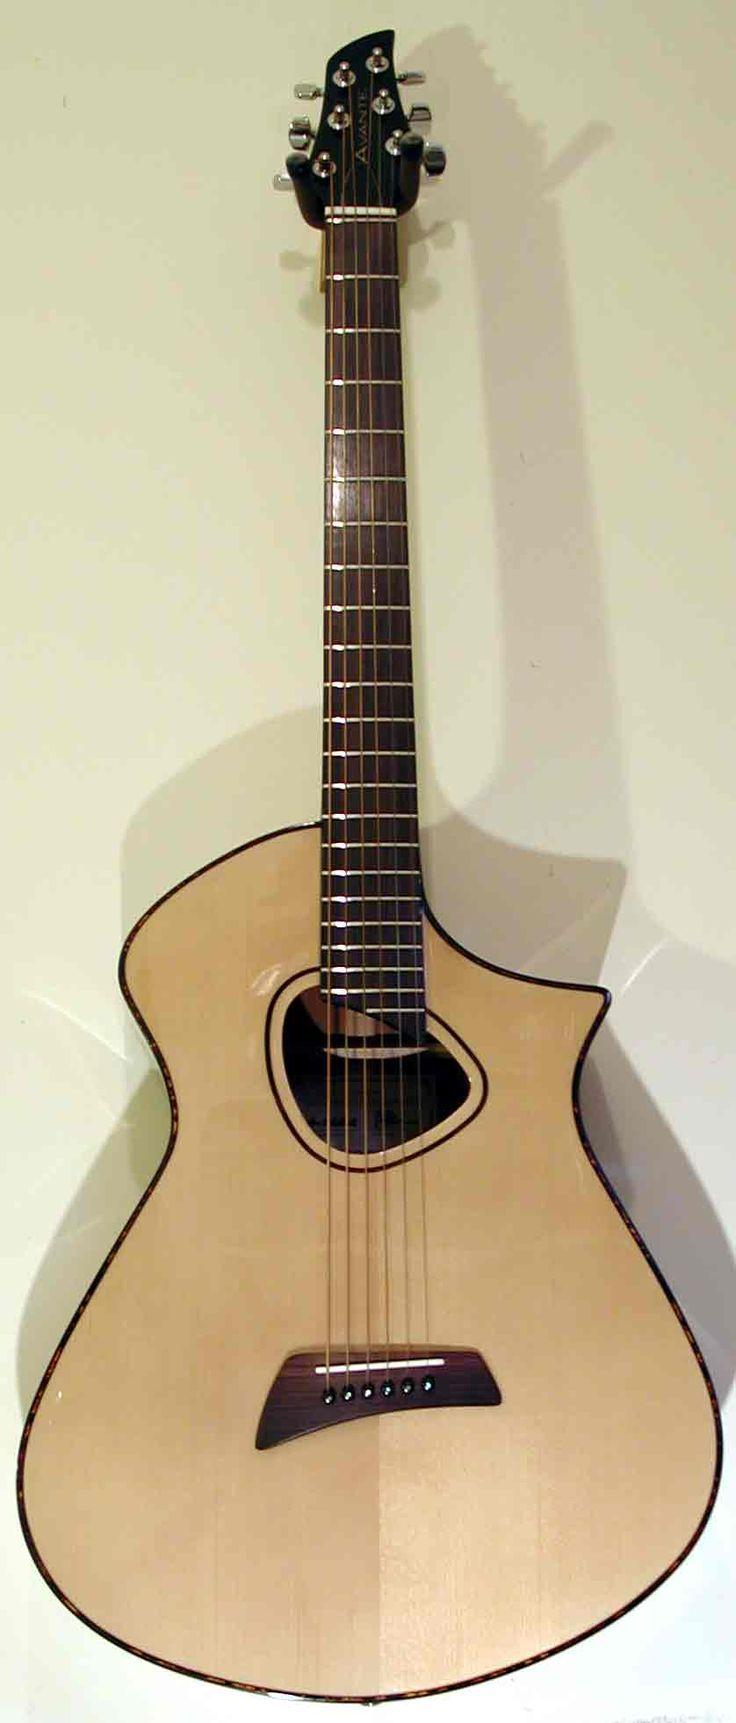 104 best images about sweet guitars on pinterest models gretsch and jazz. Black Bedroom Furniture Sets. Home Design Ideas